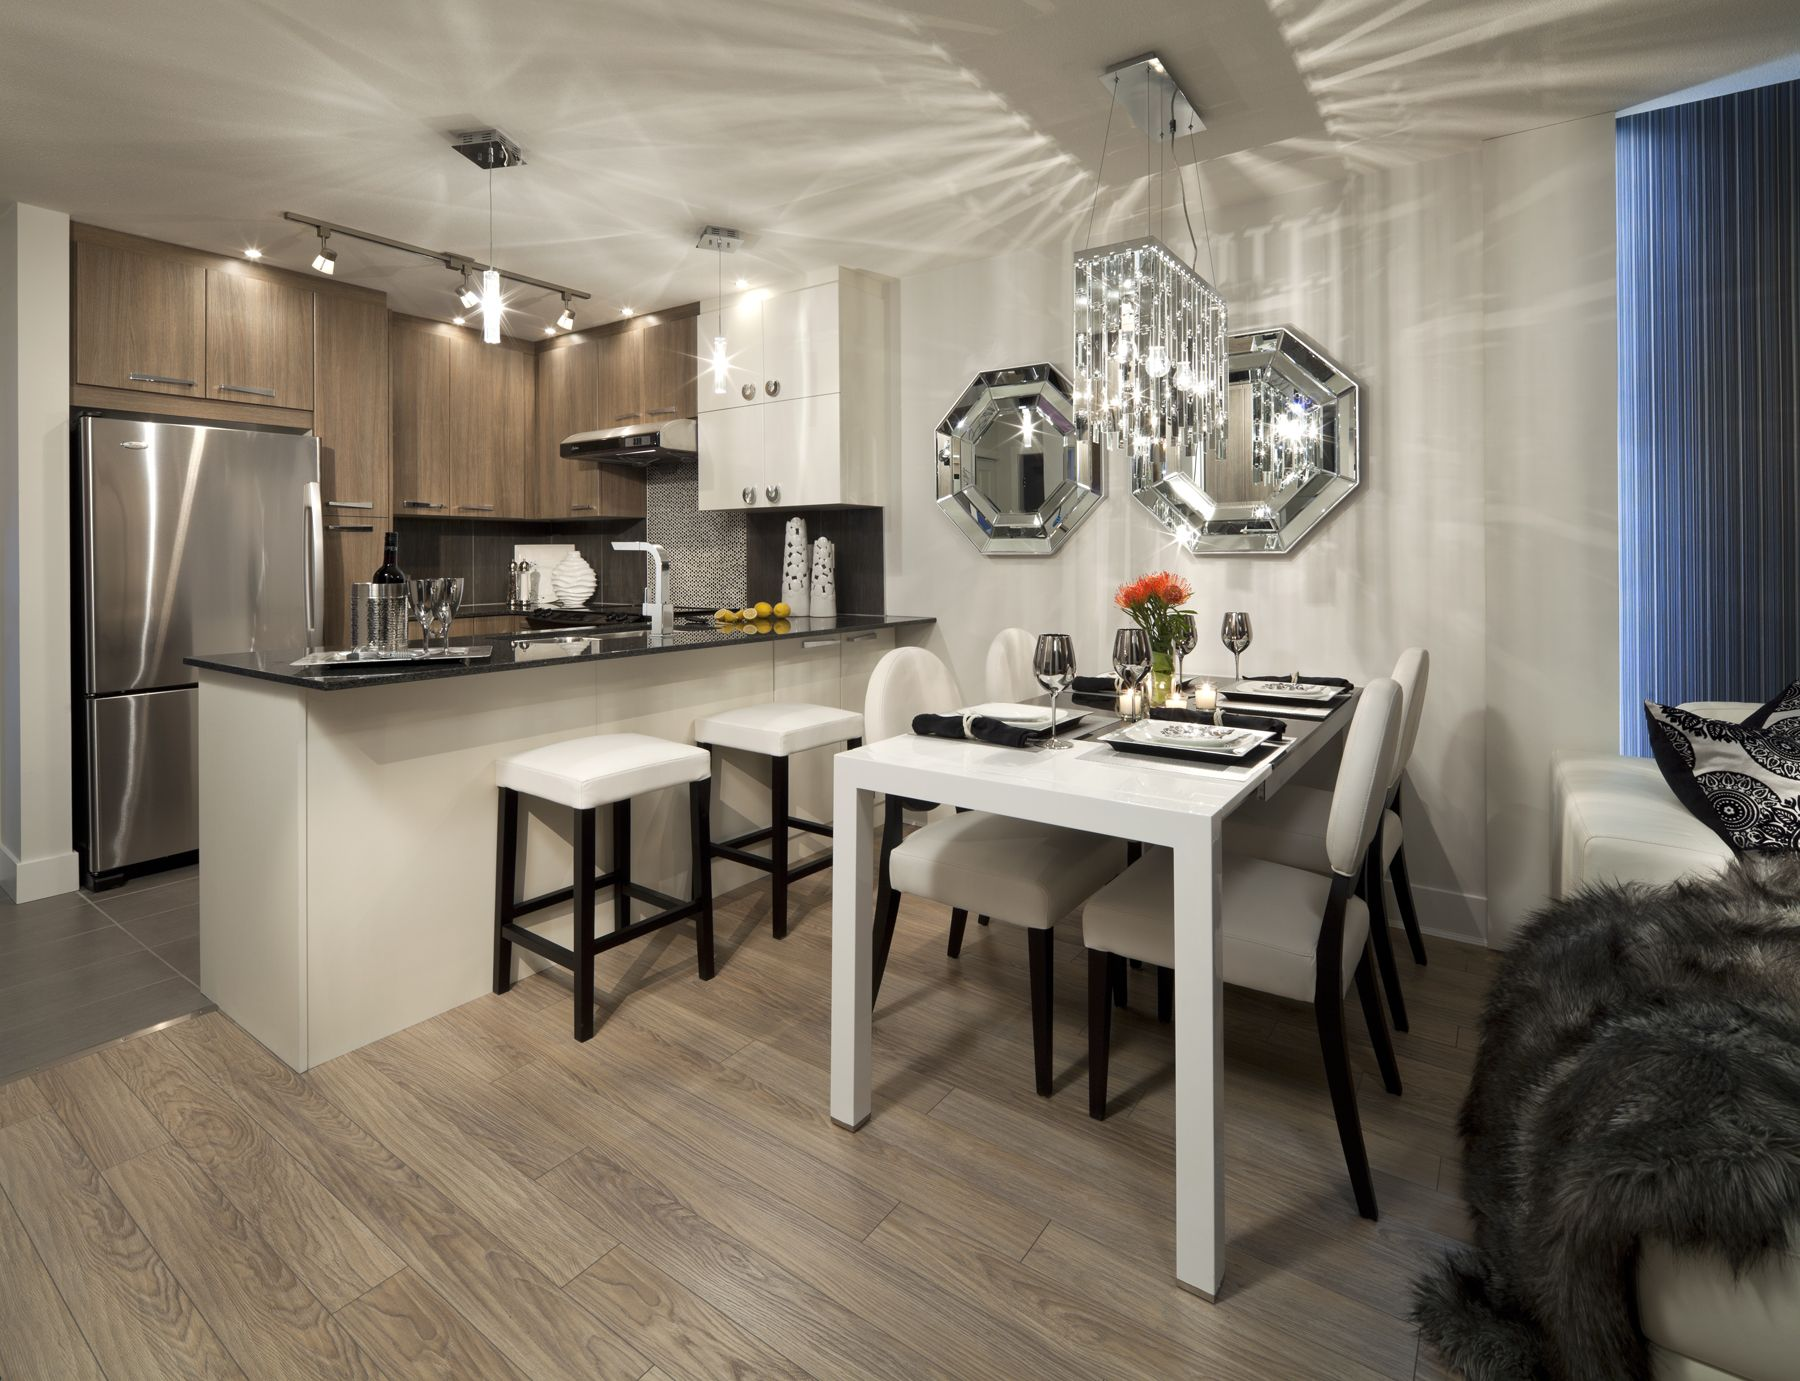 http fifthave ca site php site http www liveatascend com apartment decor condo kitchen home on kitchen interior small space id=31999